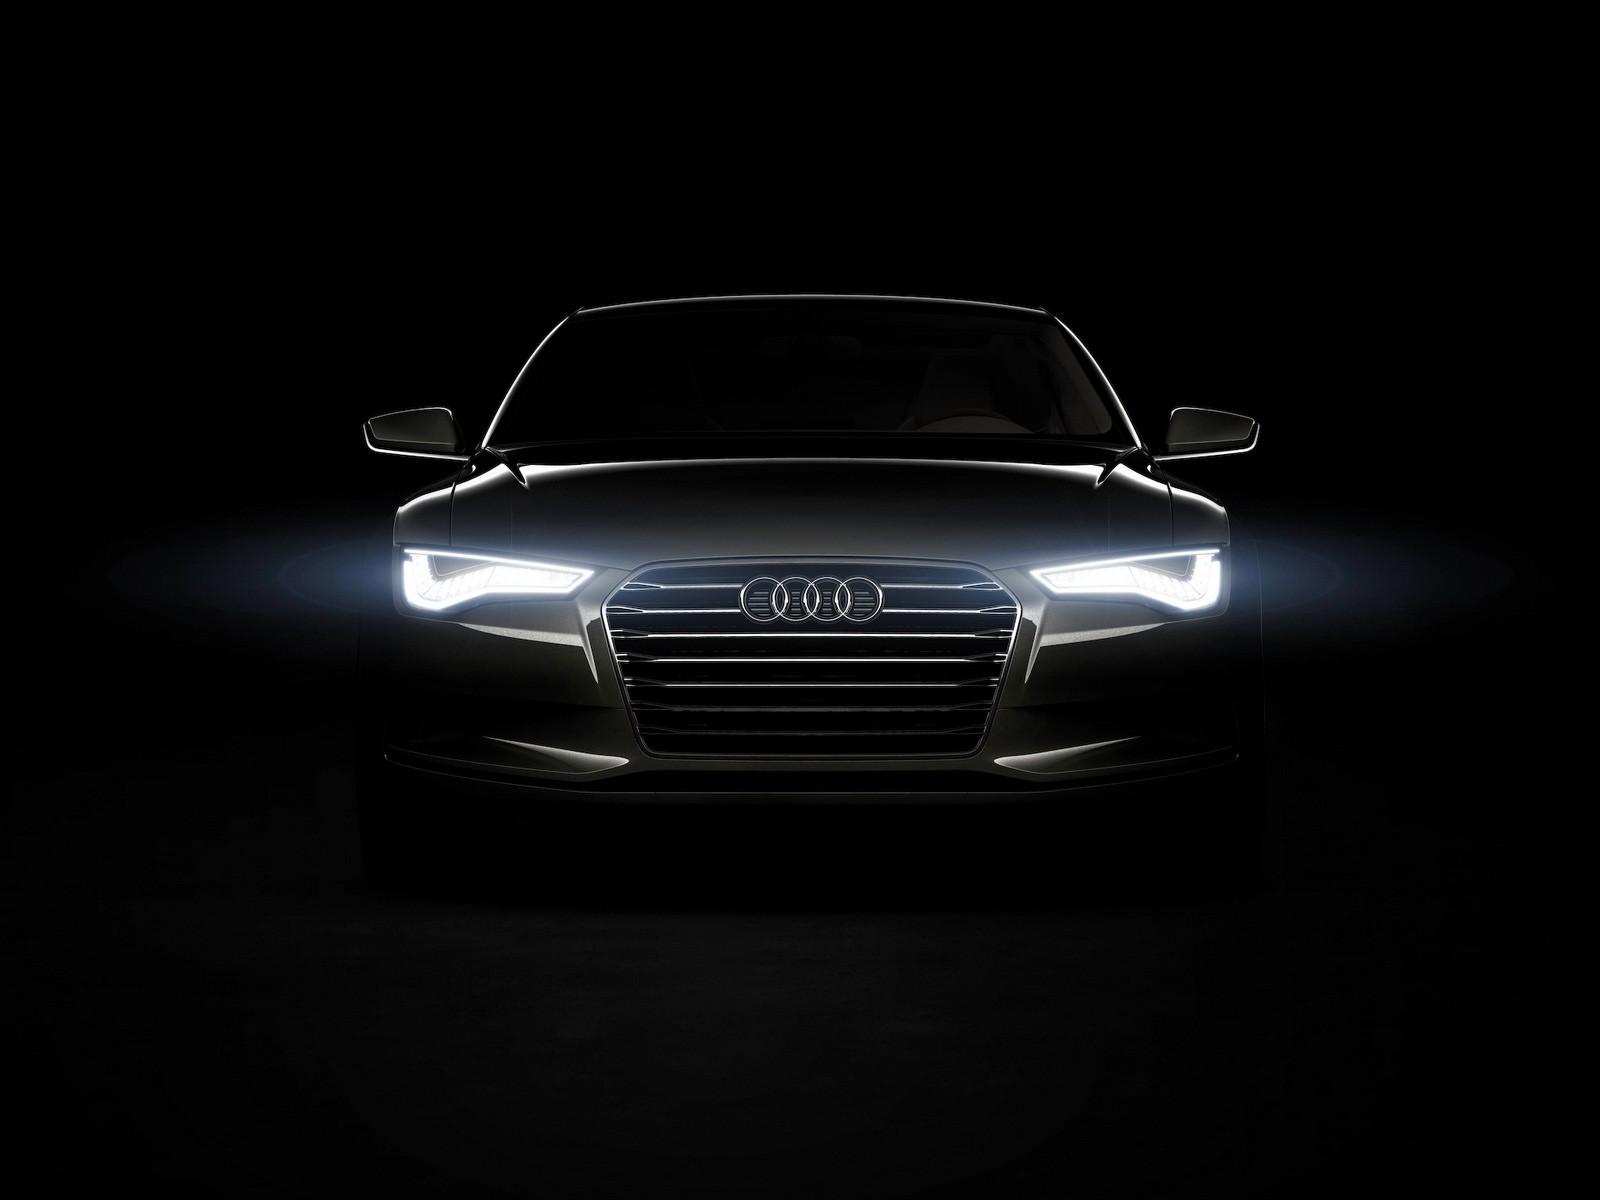 Amazing Audi Wallpaper